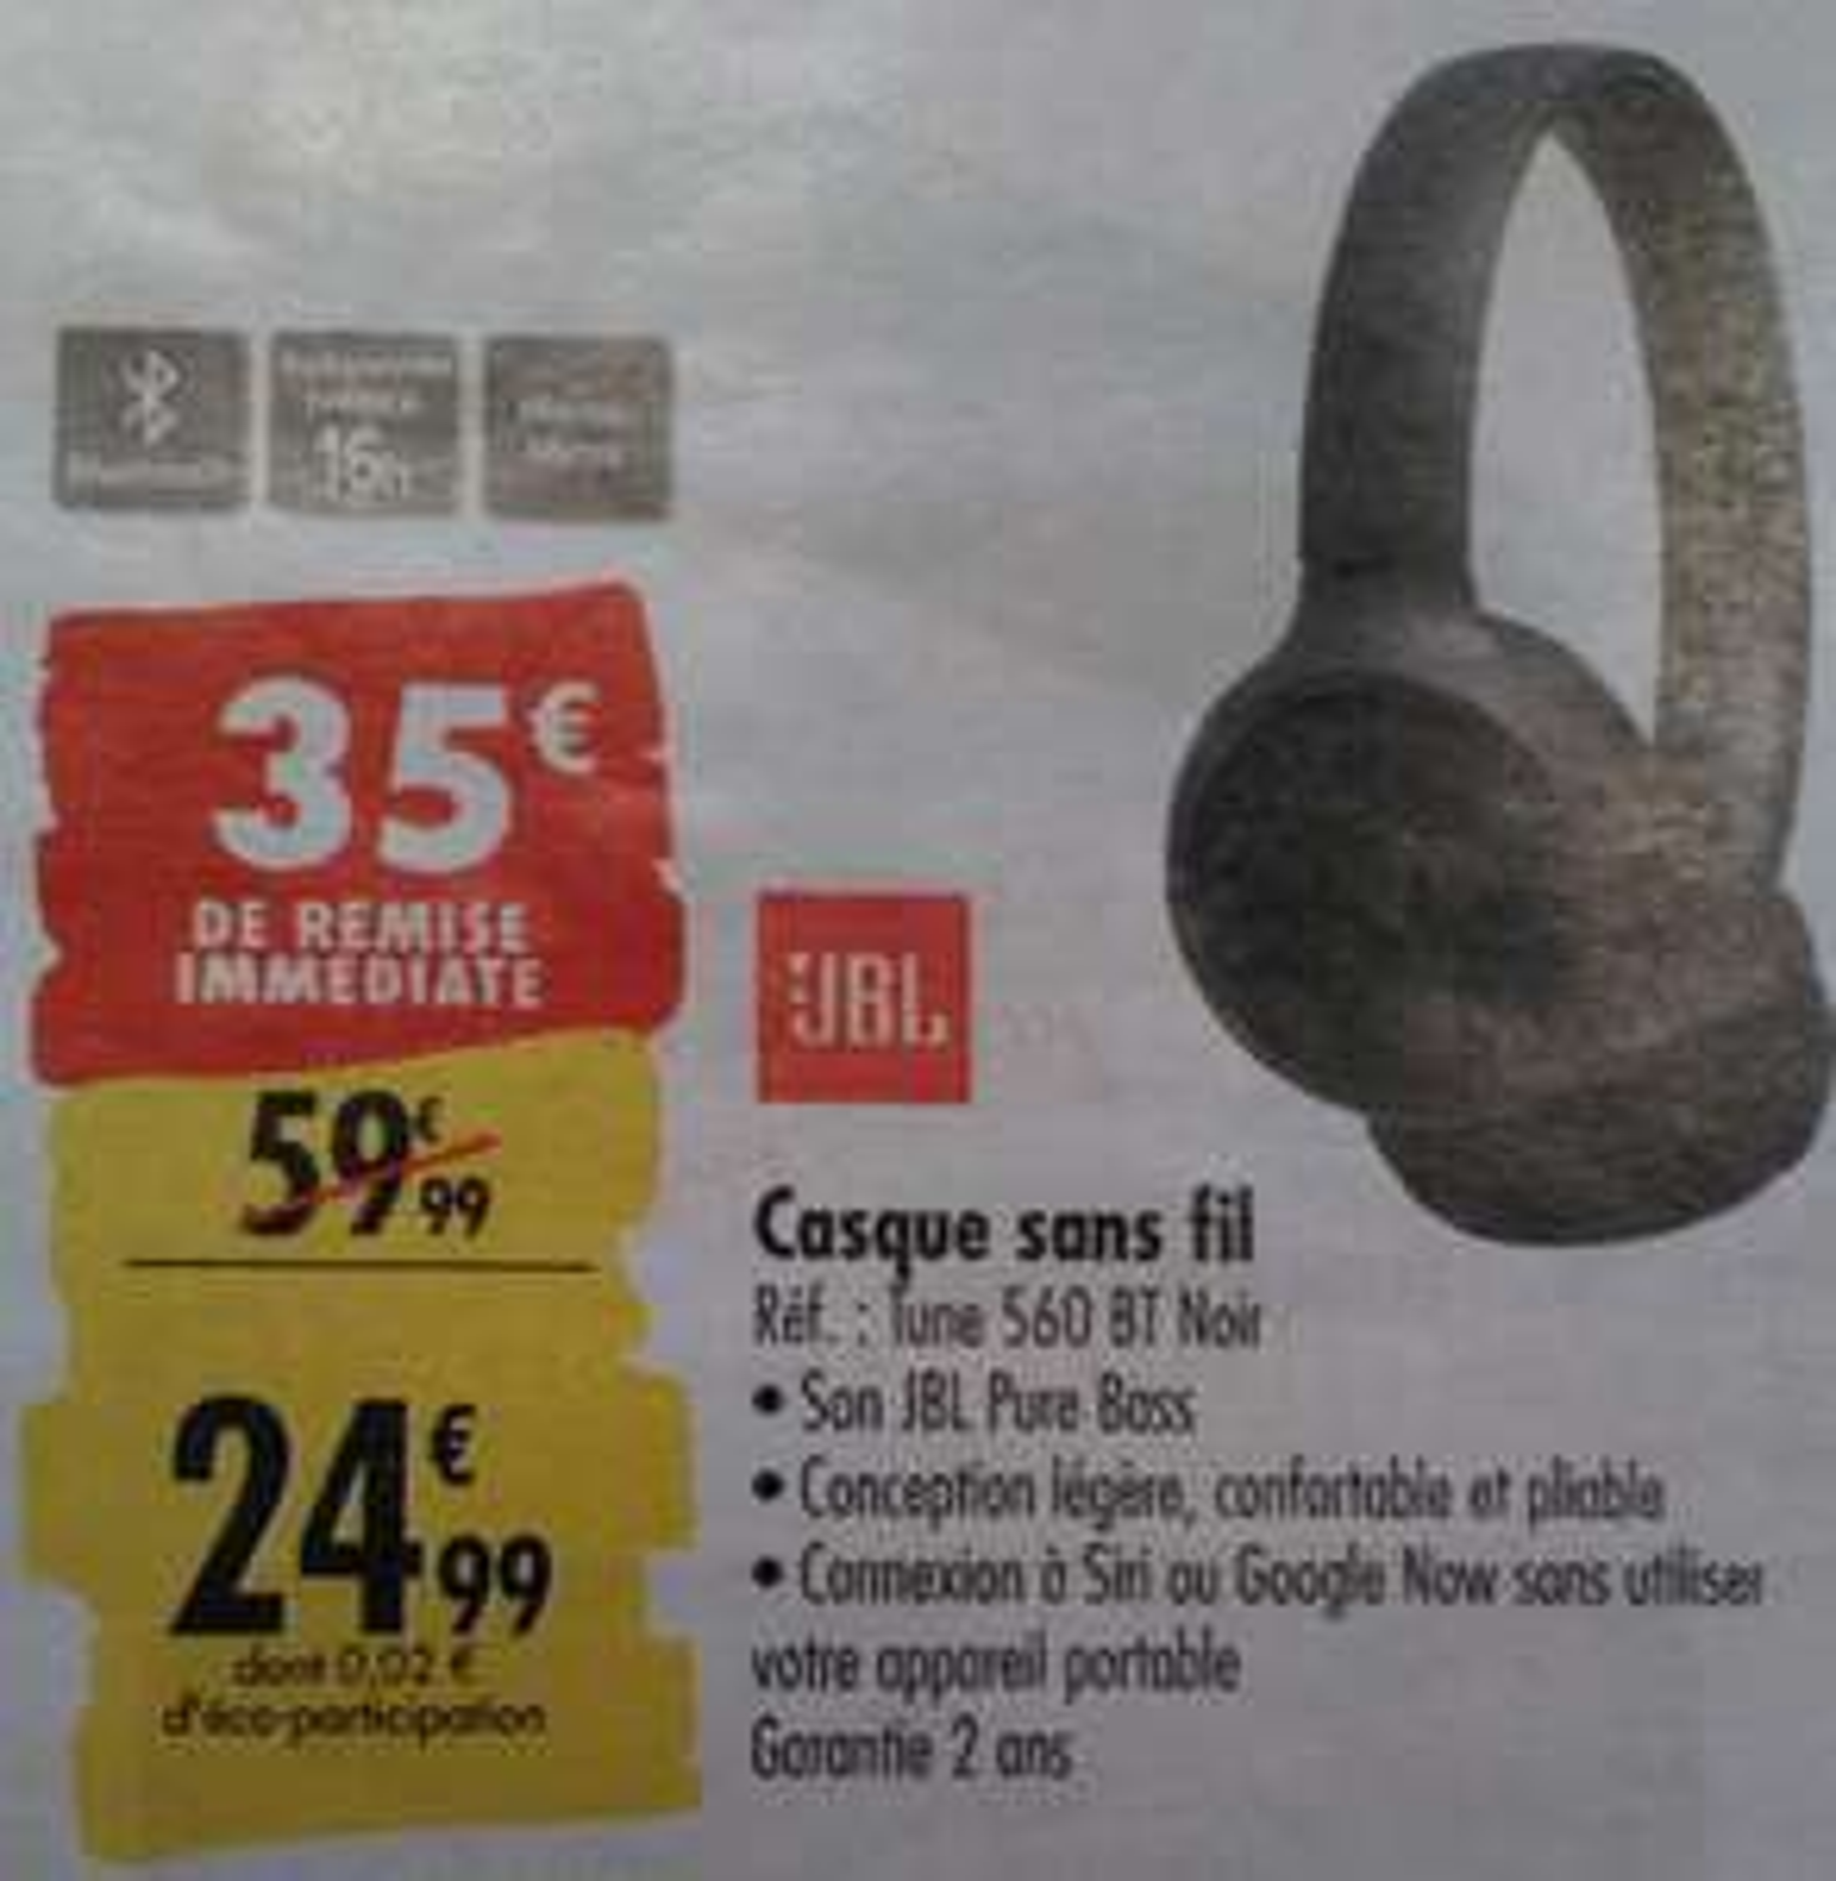 Casque Audio Bluetooth JBL Tune 560 BT - Noir